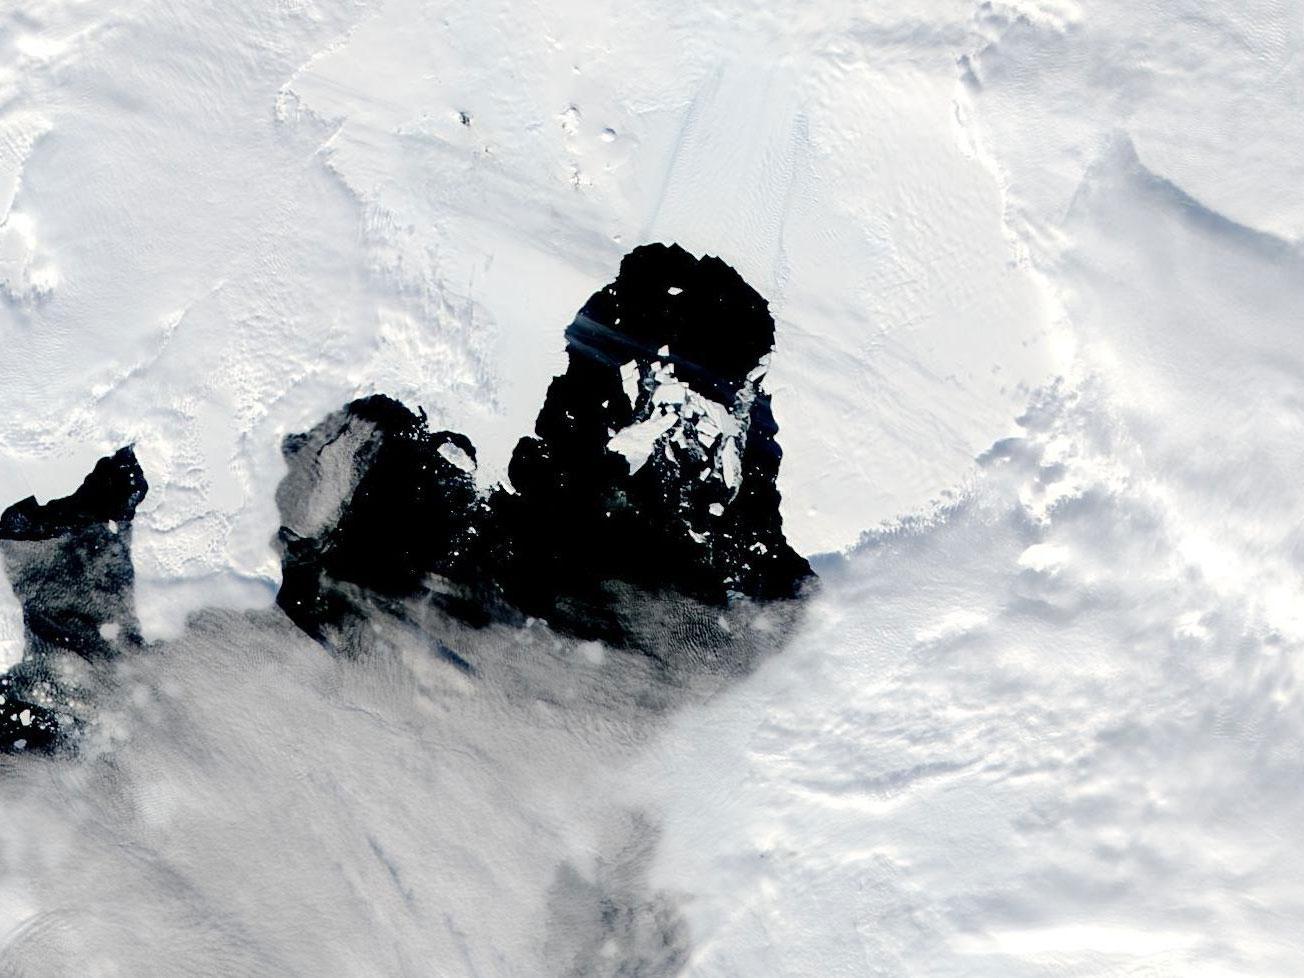 Iceberg B49 on 15 February 2020